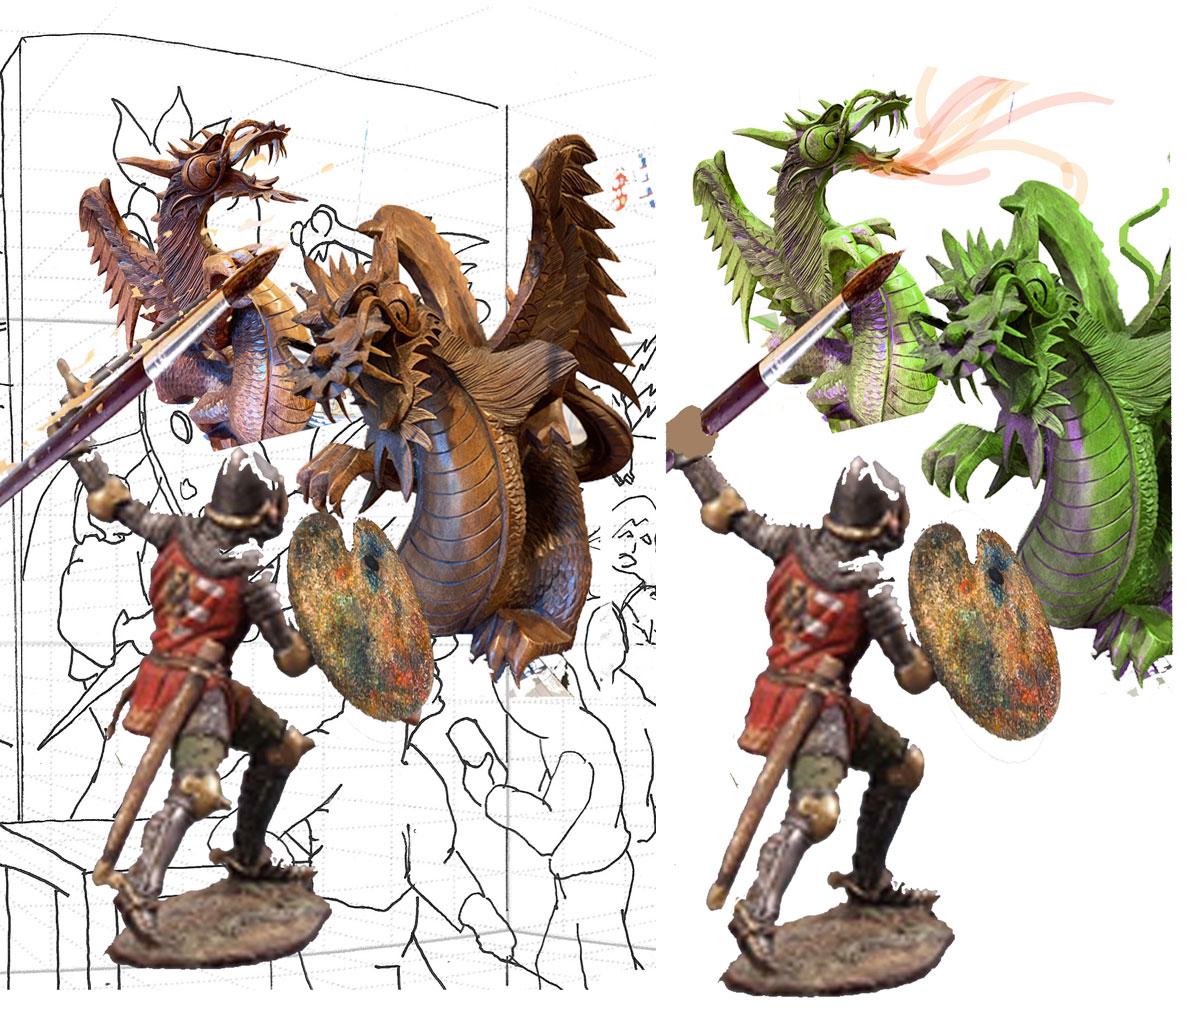 photoshopped dragon and knight image